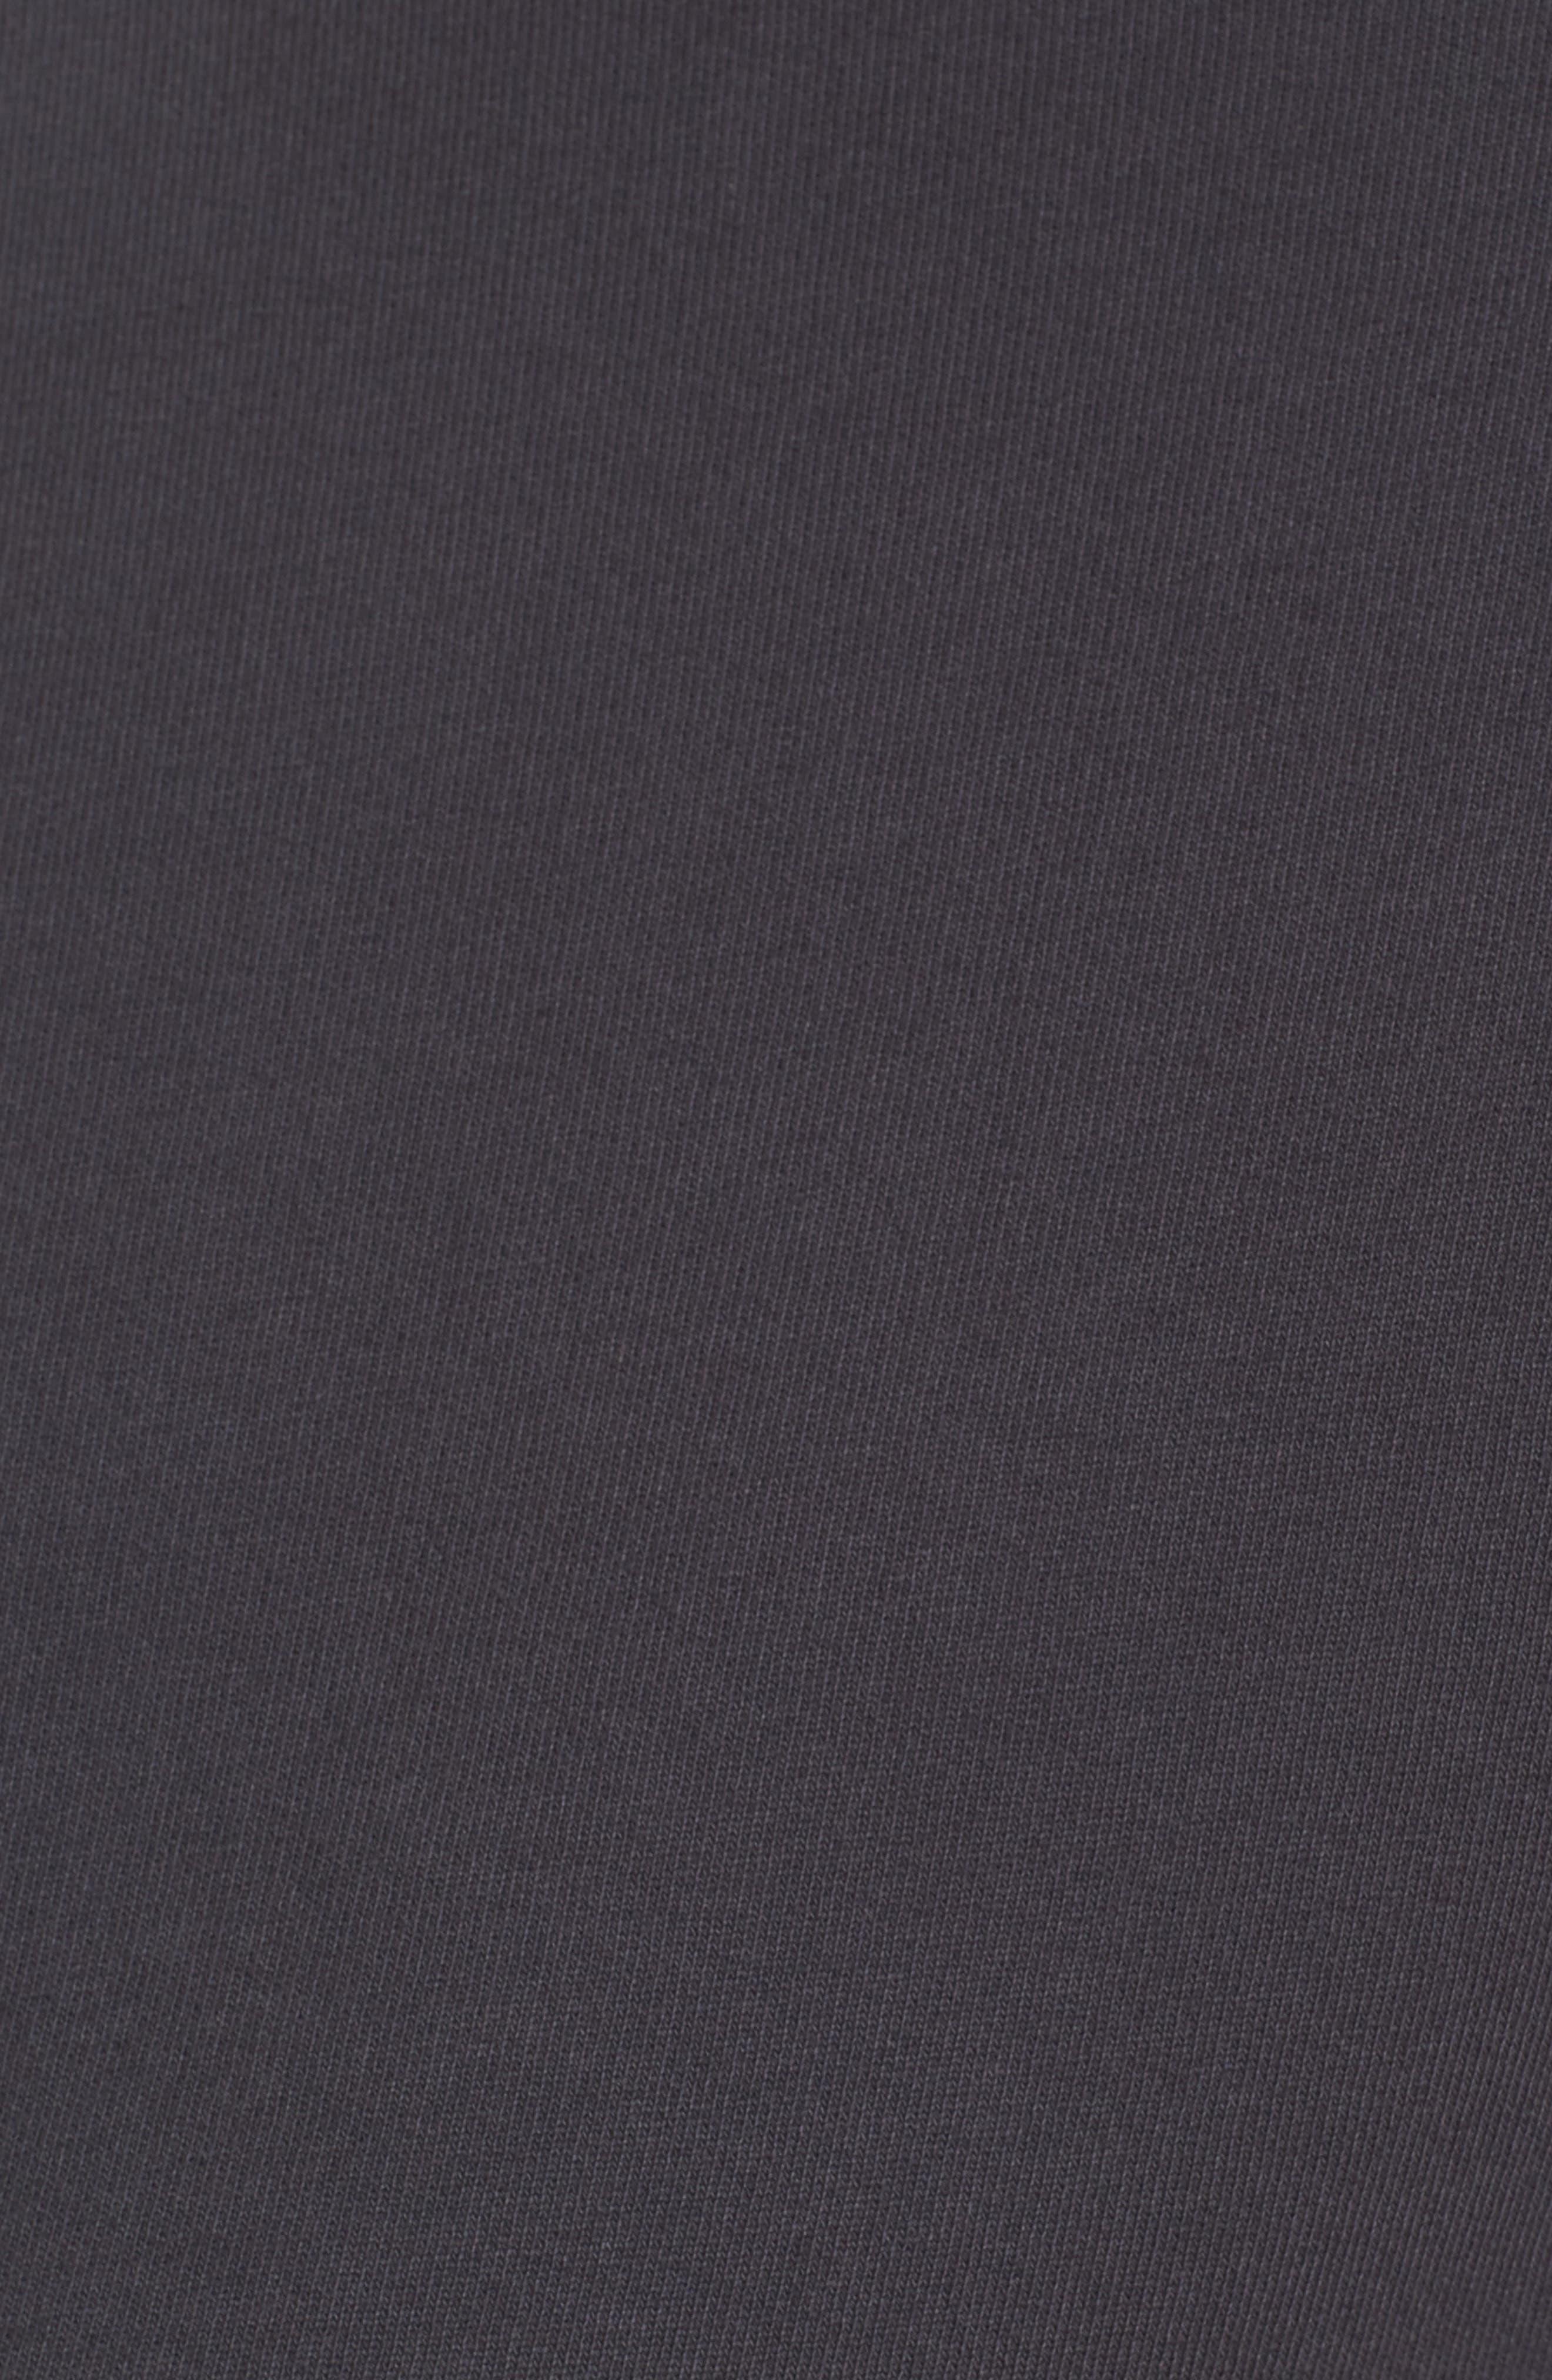 Cotton Poncho,                             Alternate thumbnail 5, color,                             019